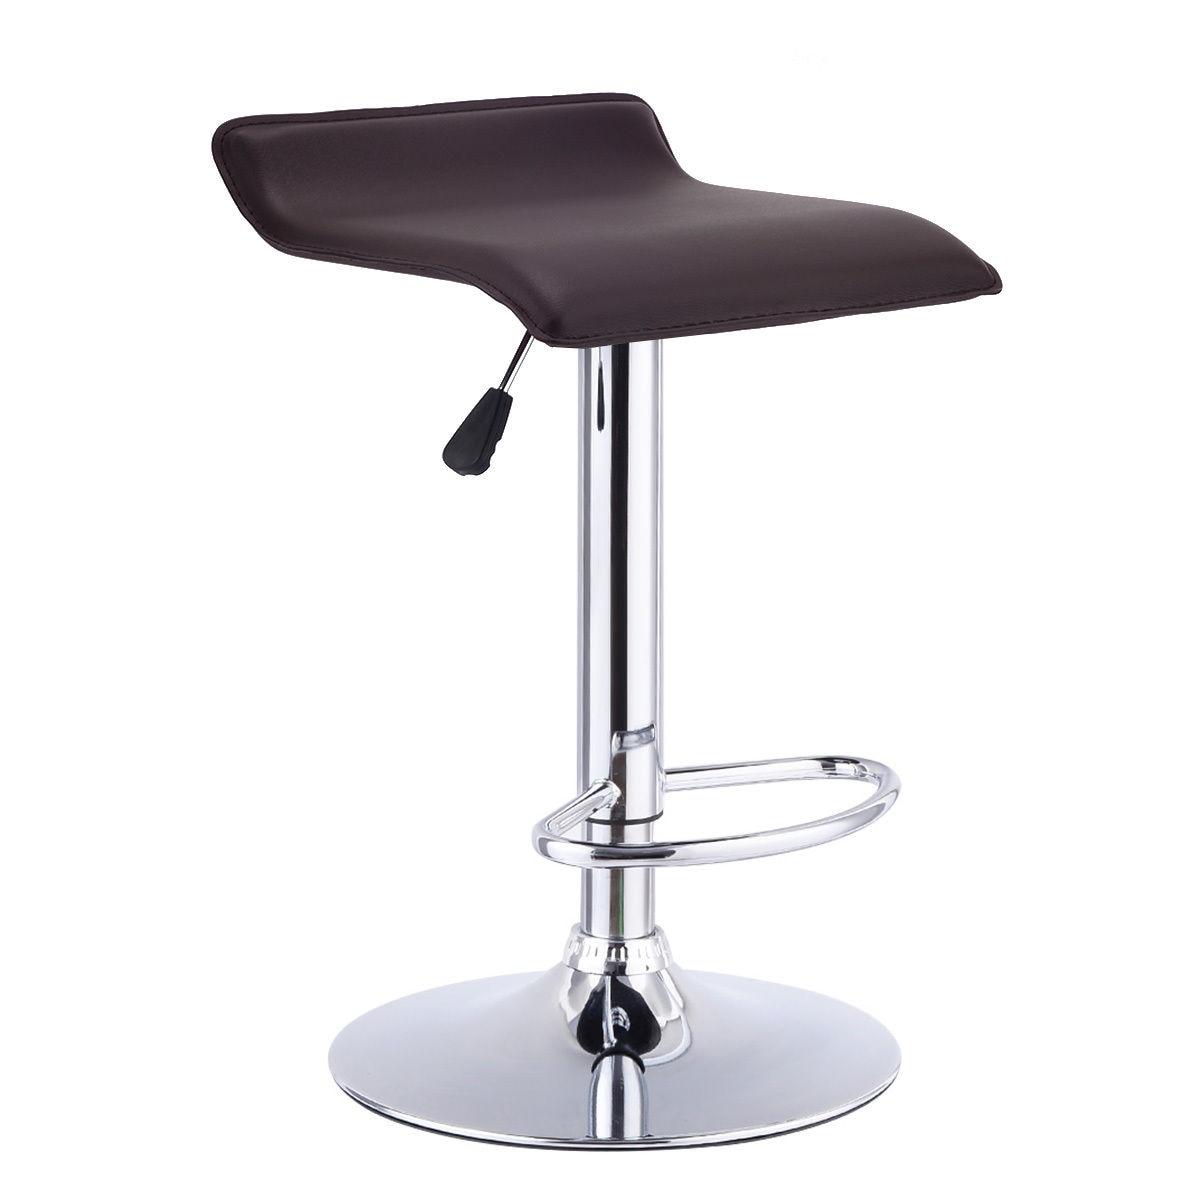 Giantex 1 PC Swivel Bar Stool Height Adjustable PU Leather Backless Dining Chair Modern Coffee Bar Chairs HW55711CF